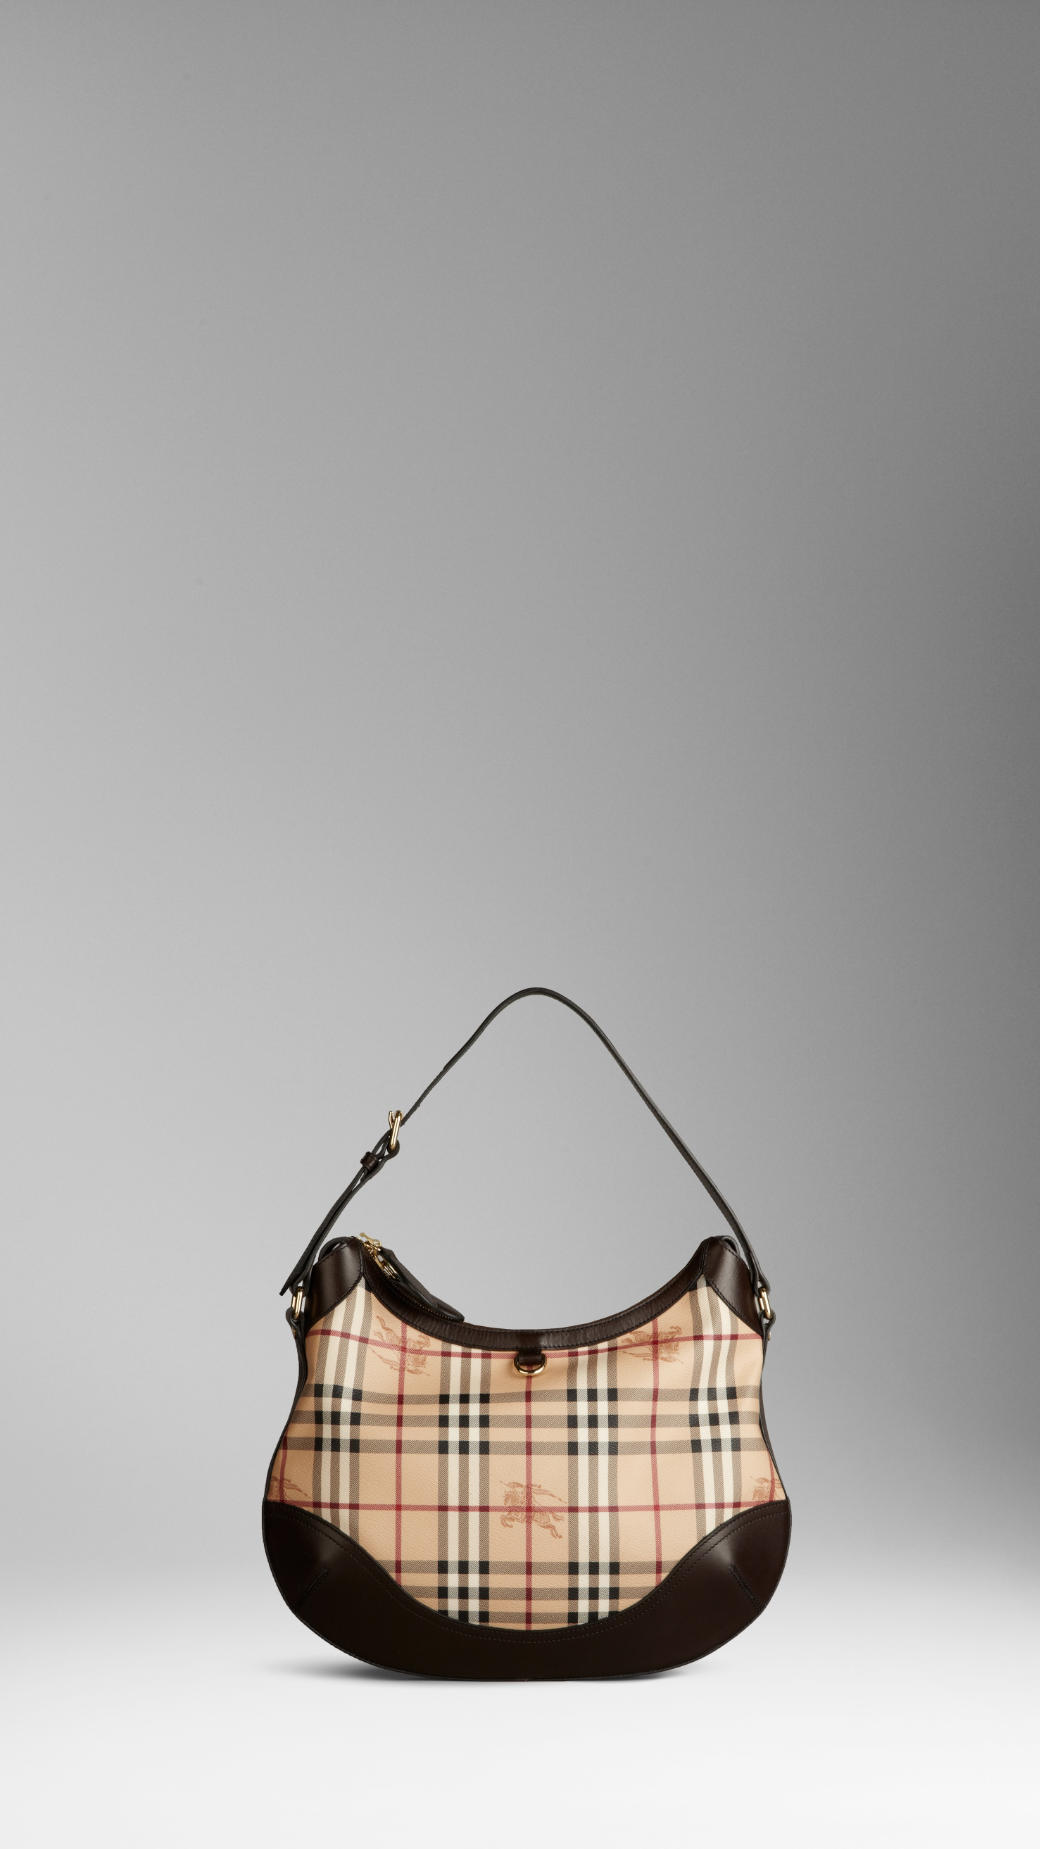 Burberry Haymarket Check Satchel Handbag - Handbag Photos ... 554fff65a0664